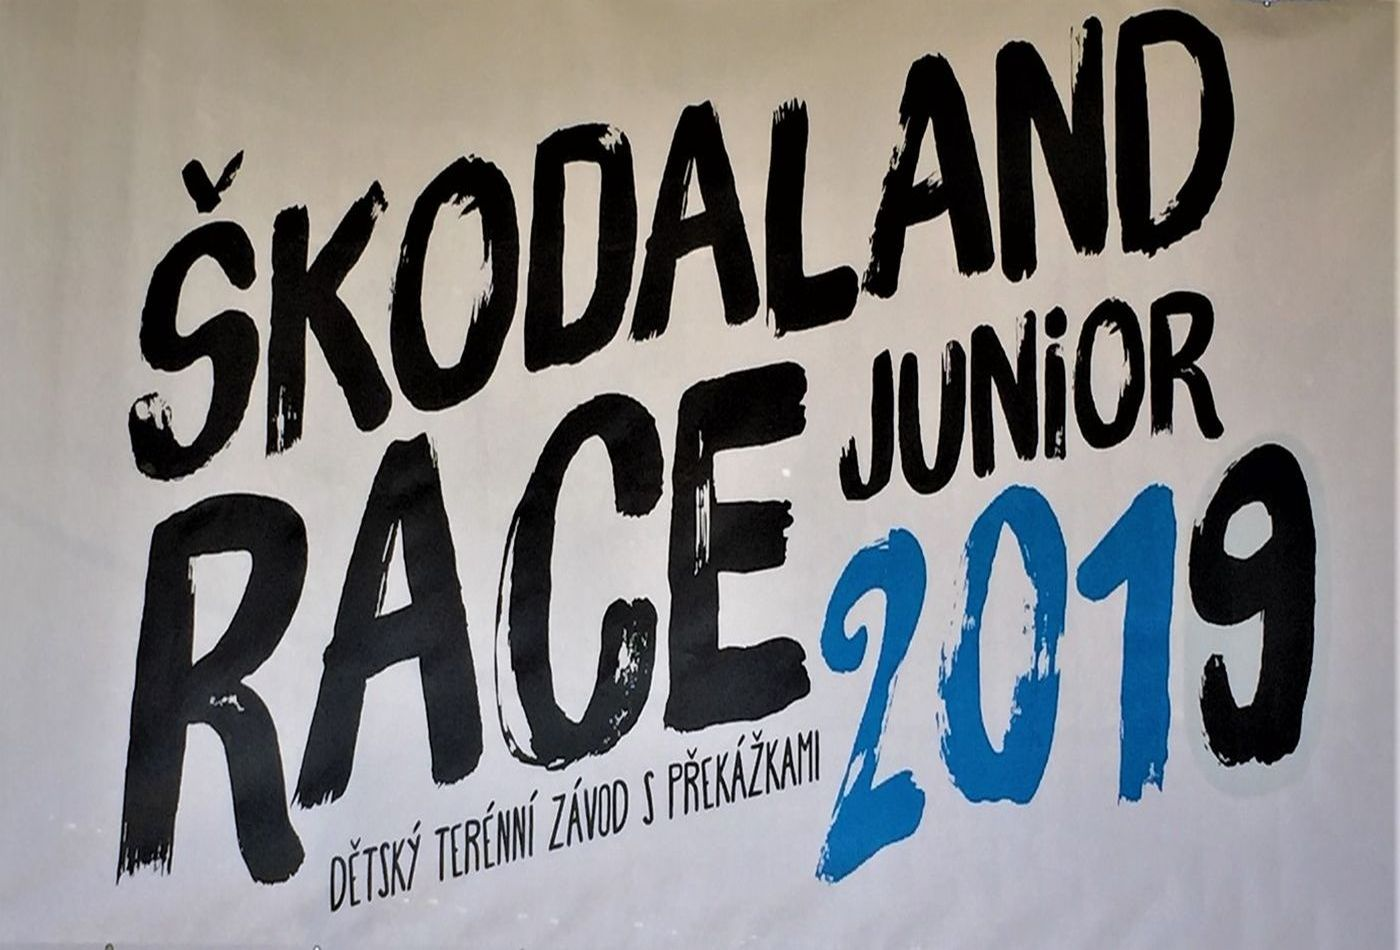 Škodaland-Race-Junior-623-1 (1)